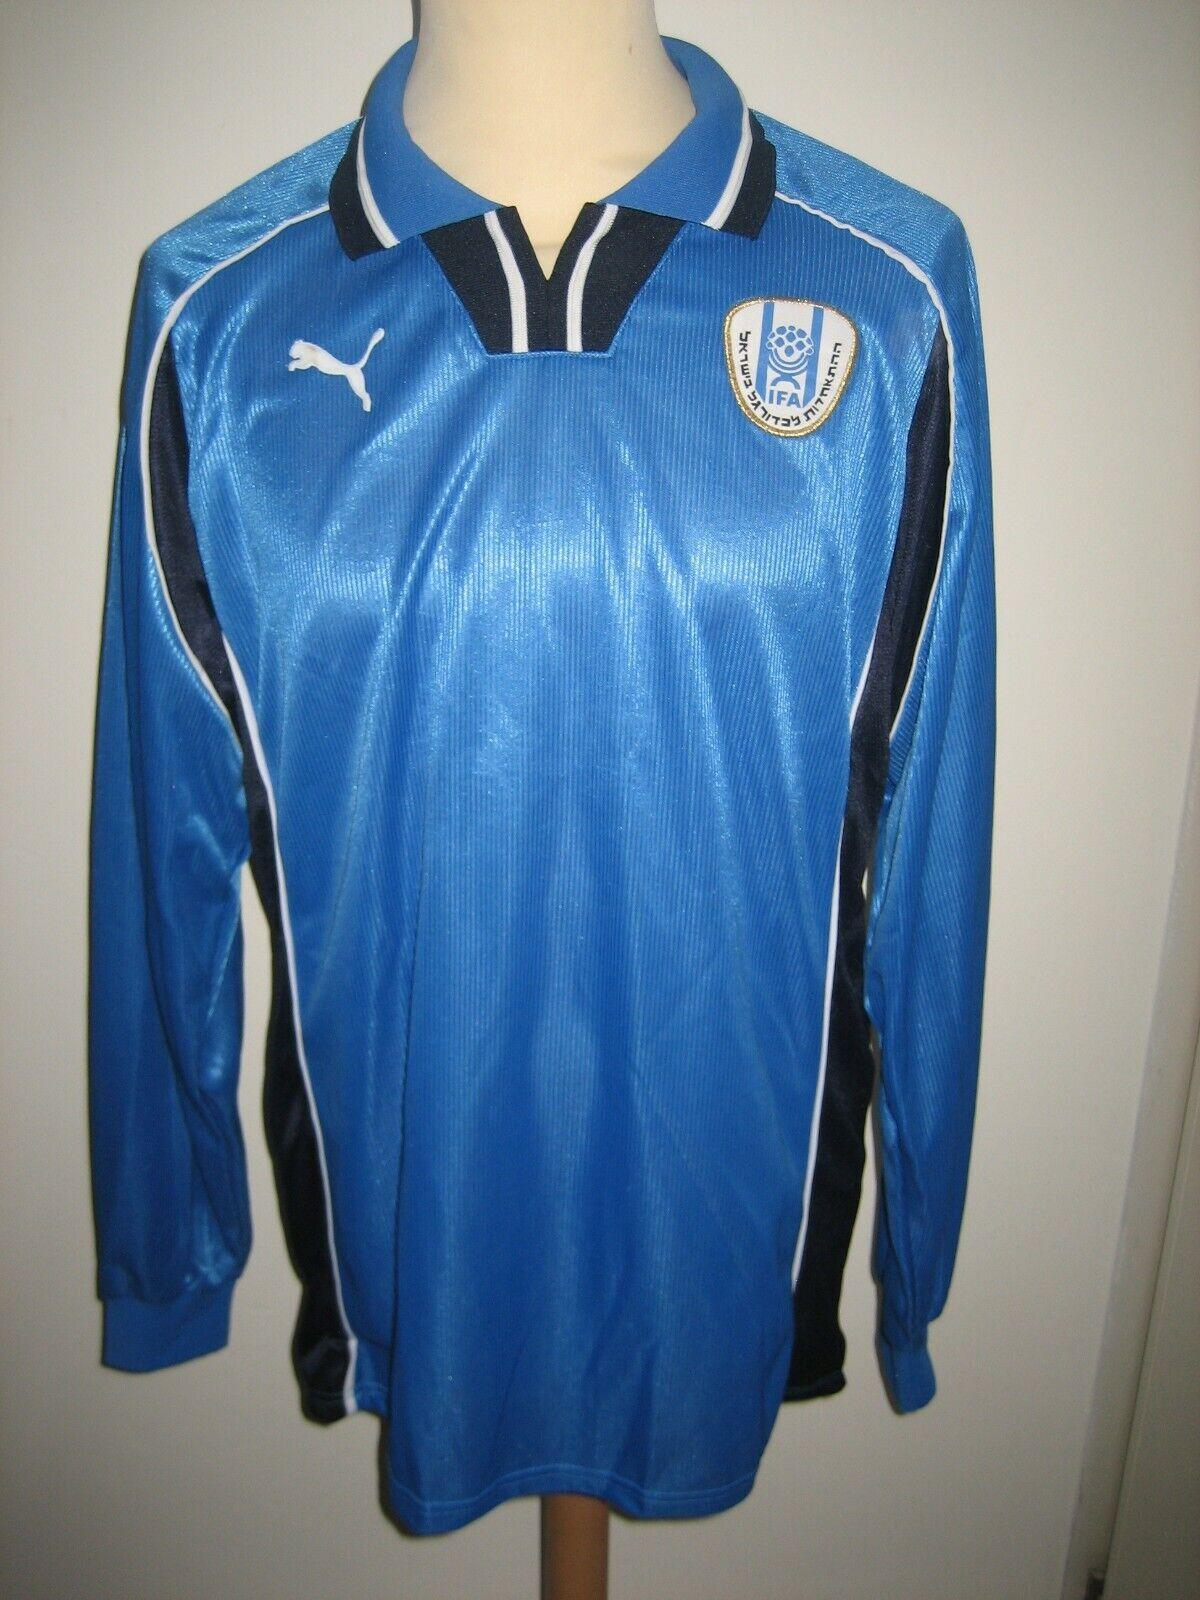 d1f6efc3b Israel 90 s home IFA shirt soccer jersey maillot trikot vintage size XL  football nulfcb4850-Overig